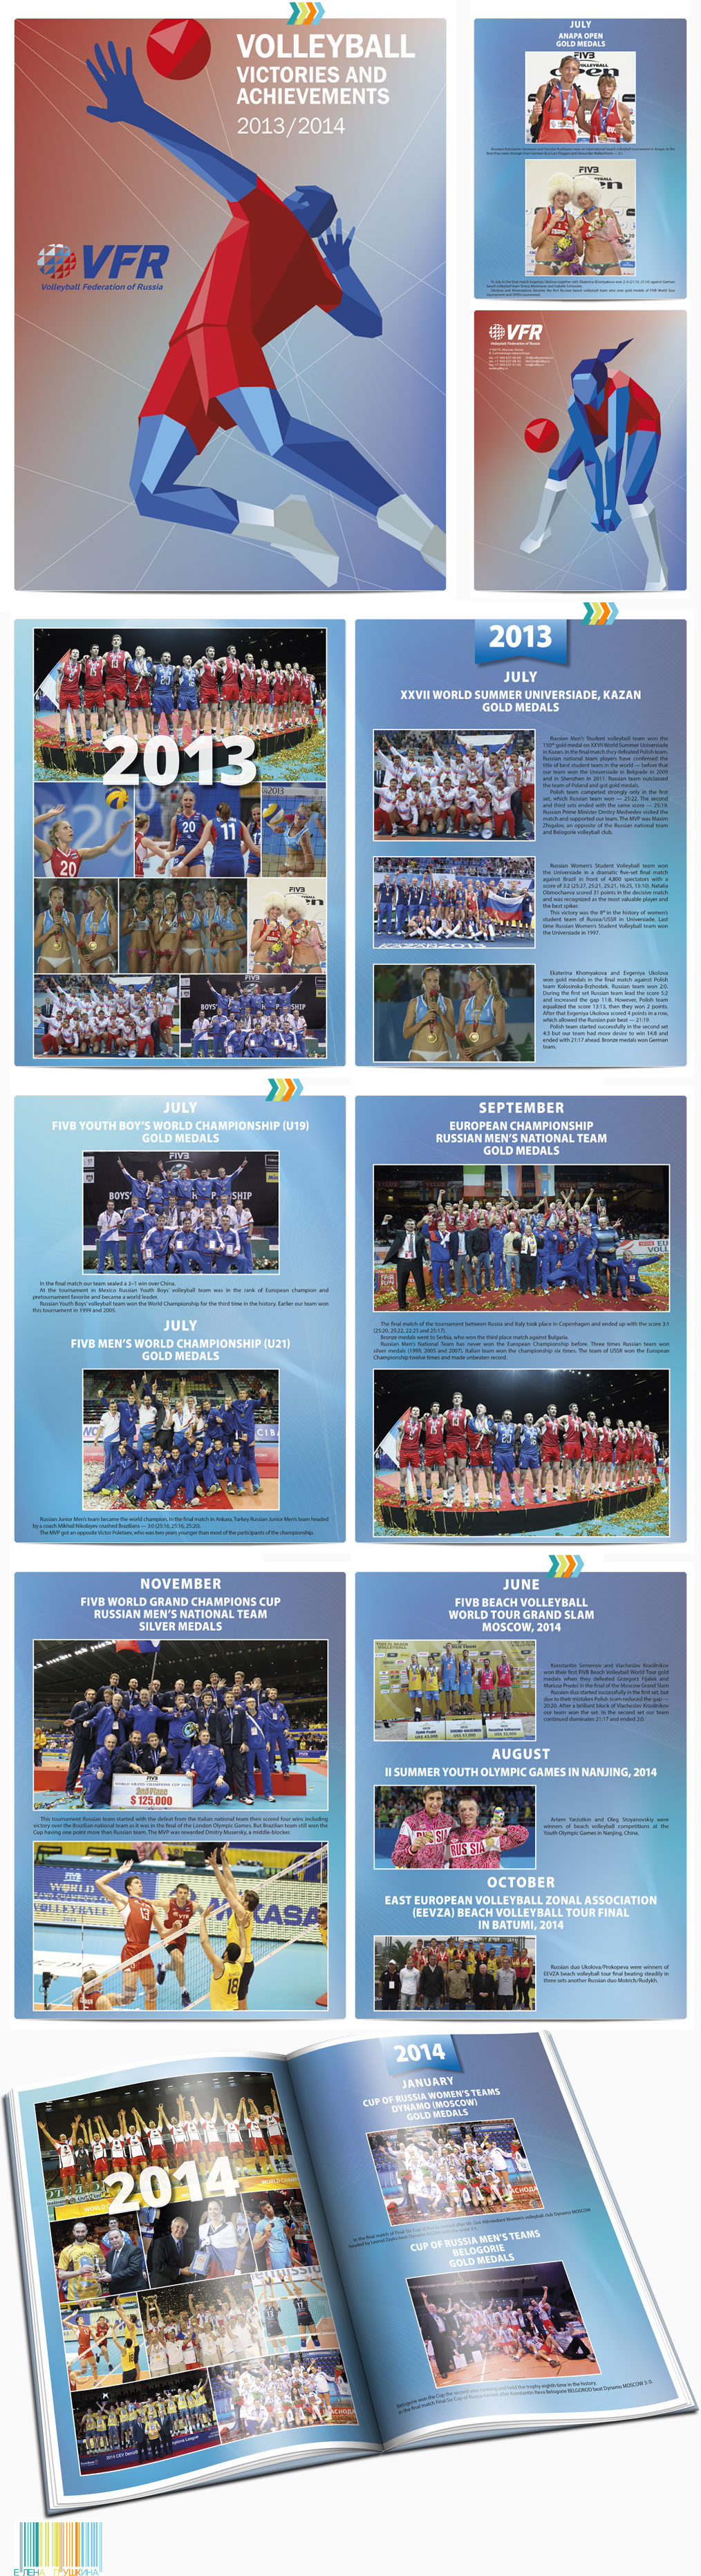 «VOLLEYBALL victories and achievements»— разработка дизайна с«нуля» ивёрстка брошюры Дизайн брошюр, буклетов Портфолио